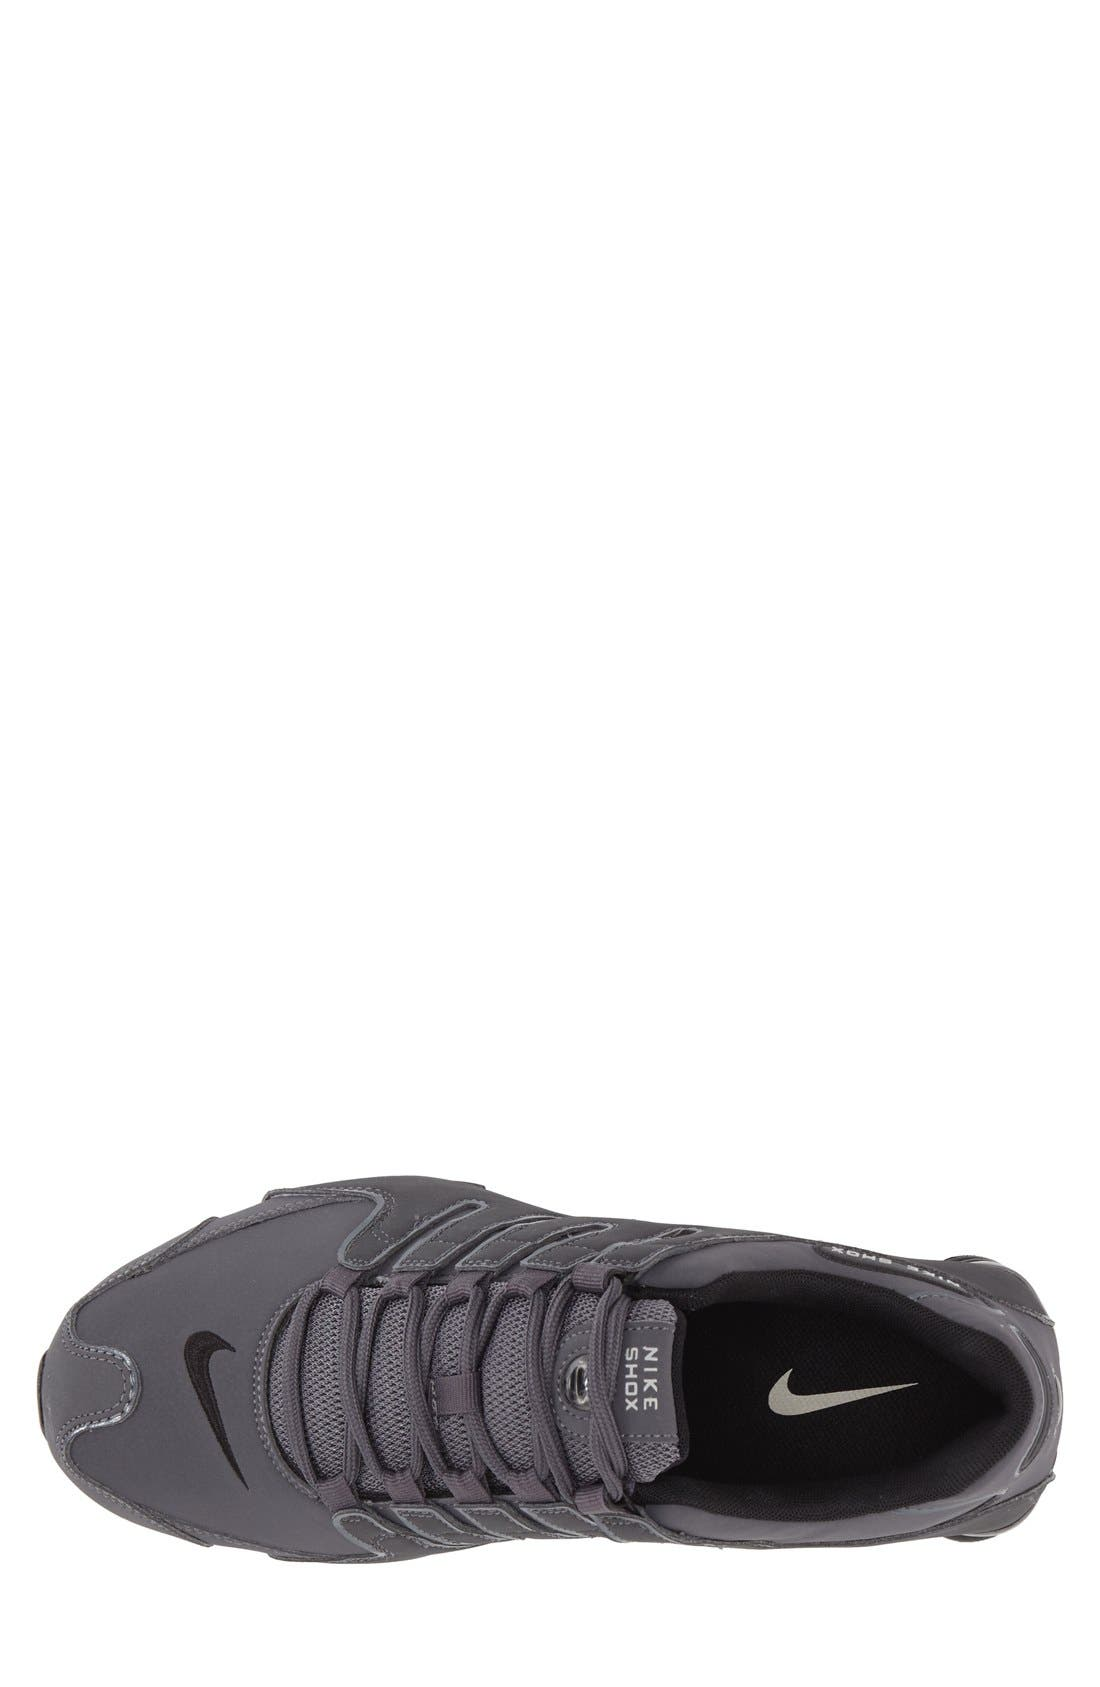 Alternate Image 3  - Nike 'Shox NZ' Running Shoe (Men)